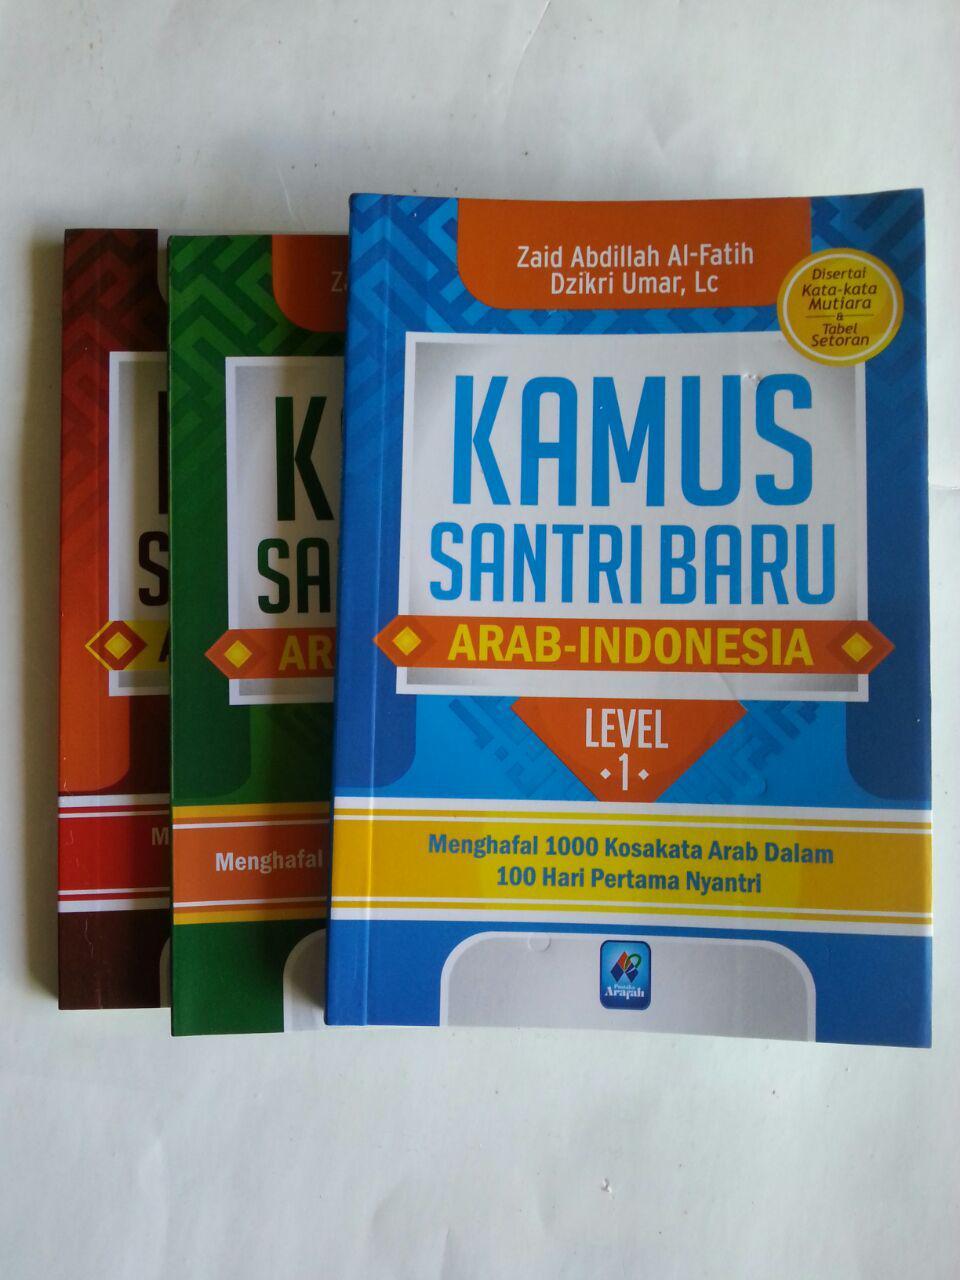 Buku Kamus Santri Baru Arab Indonesia 1 Set 3 Jilid cover 7